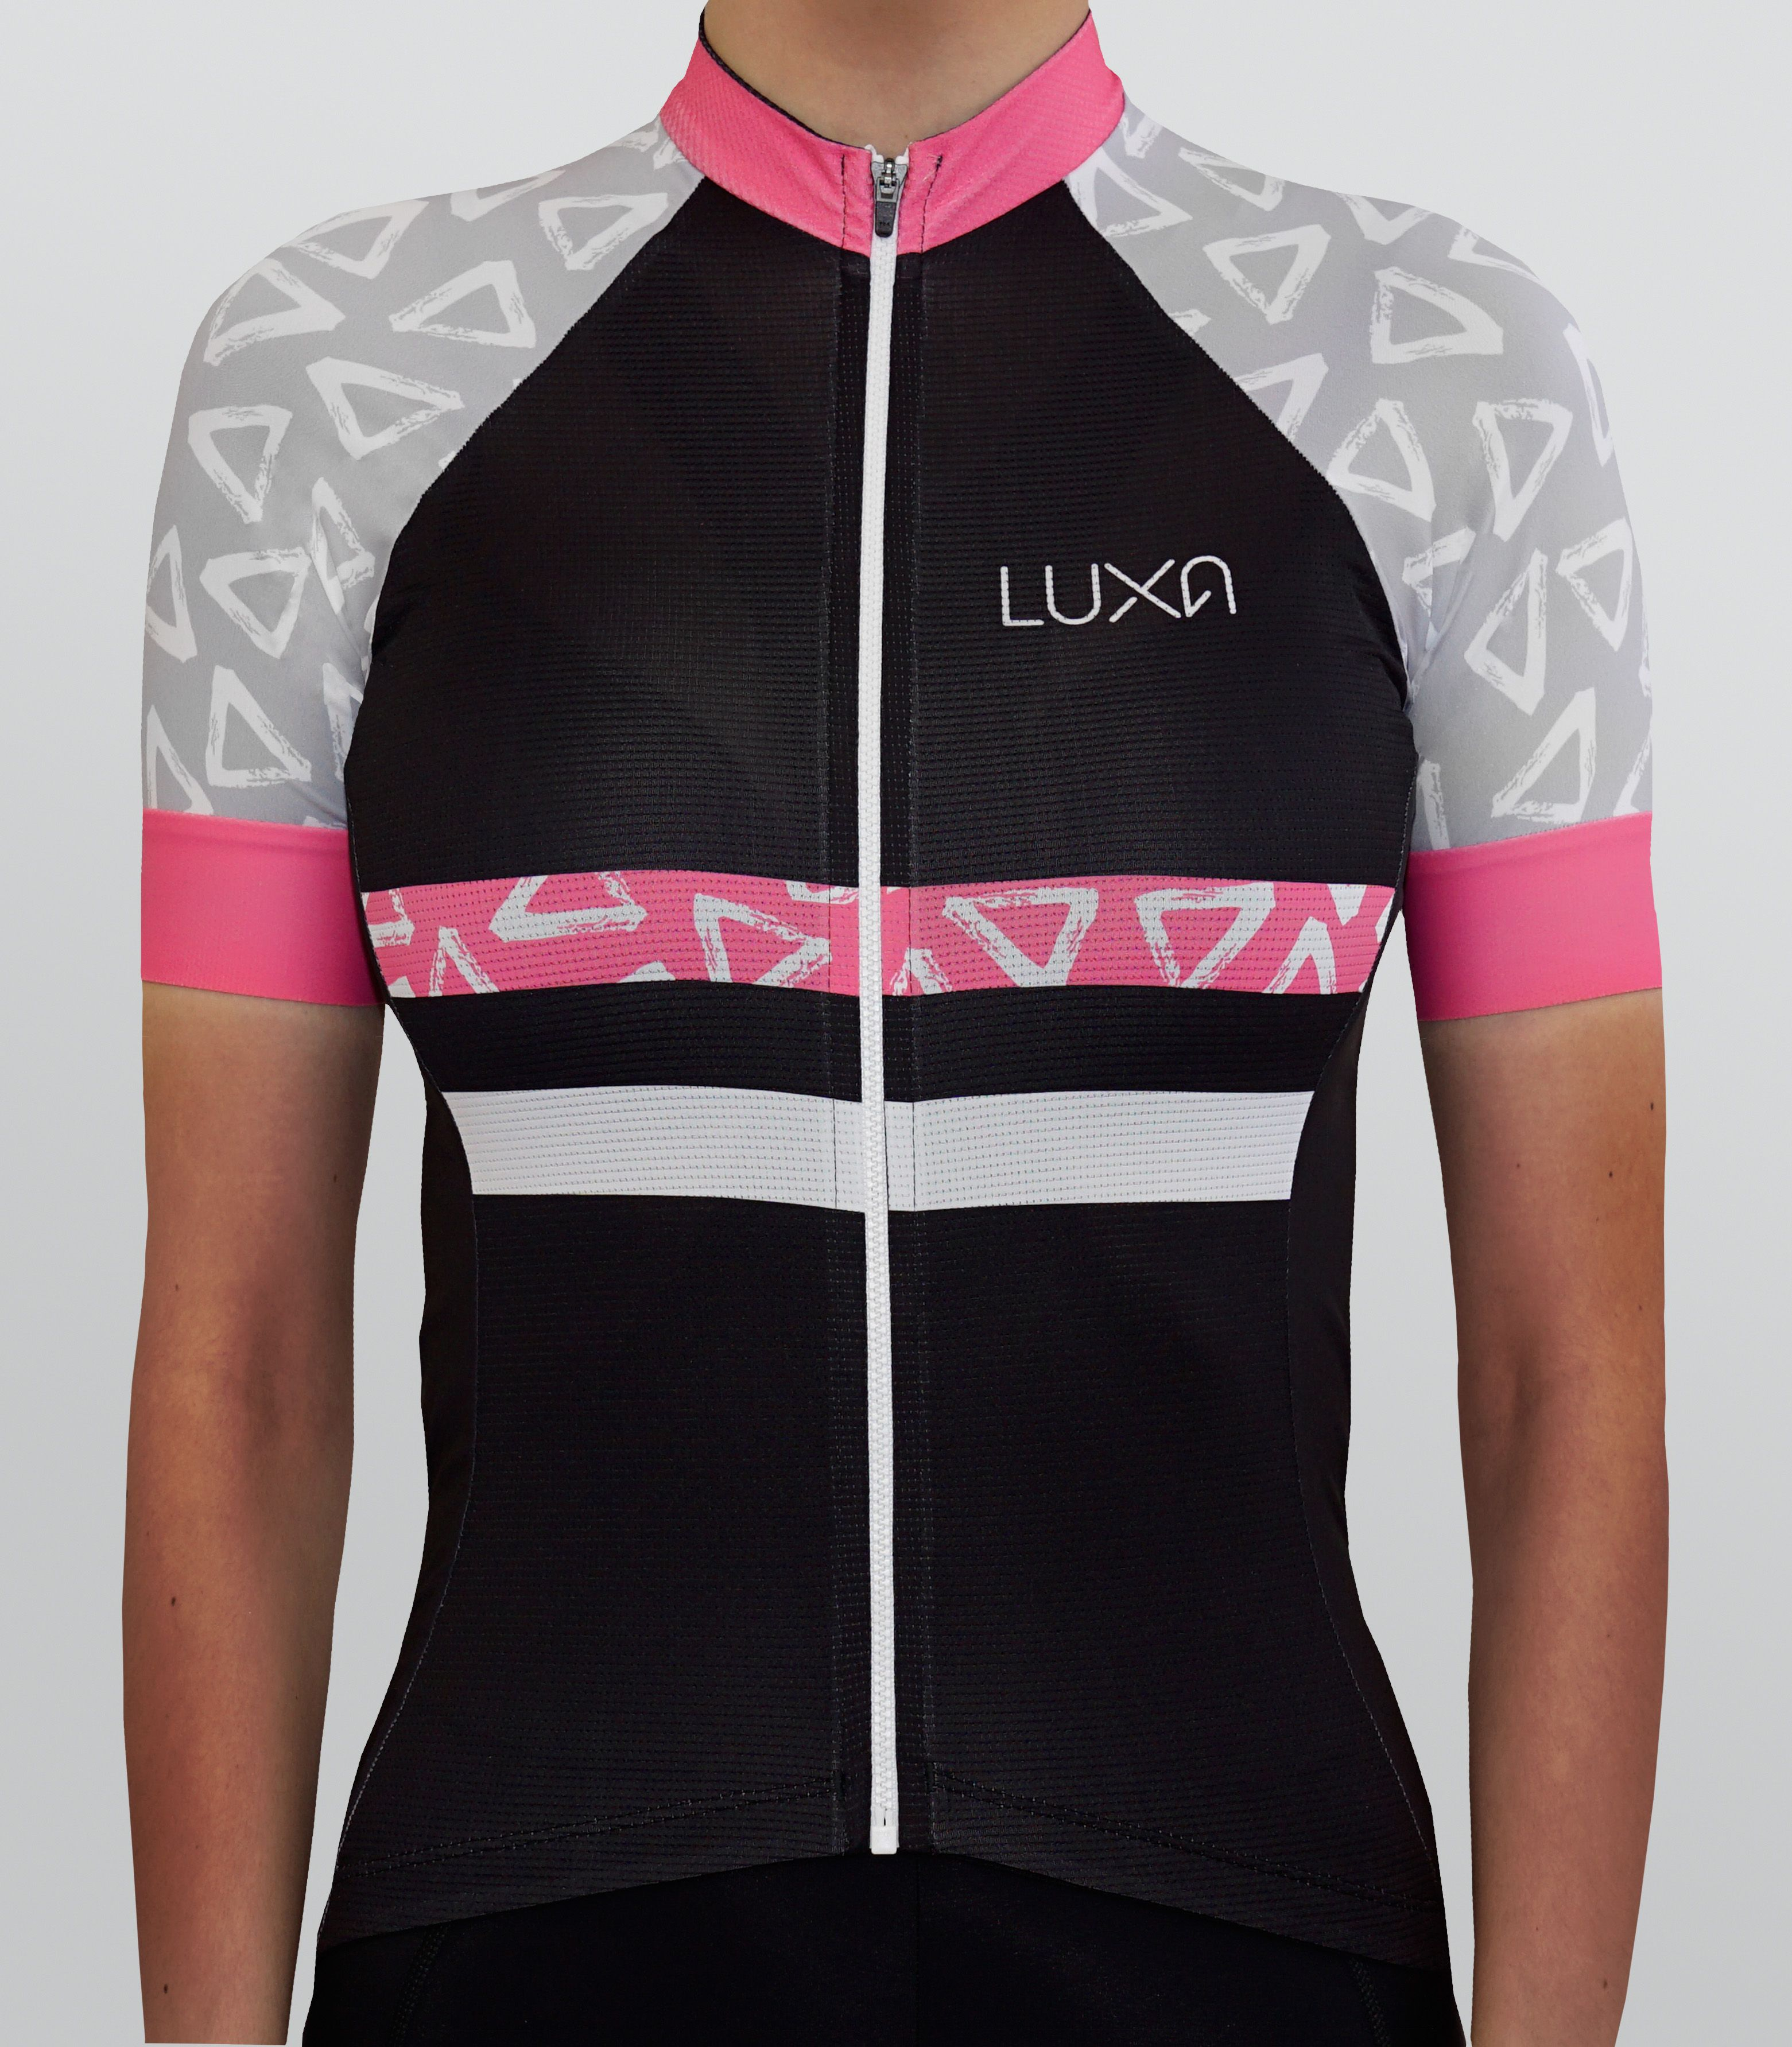 05fbaa256 Candy Avenue- Women s cycling jersey by Luxa.